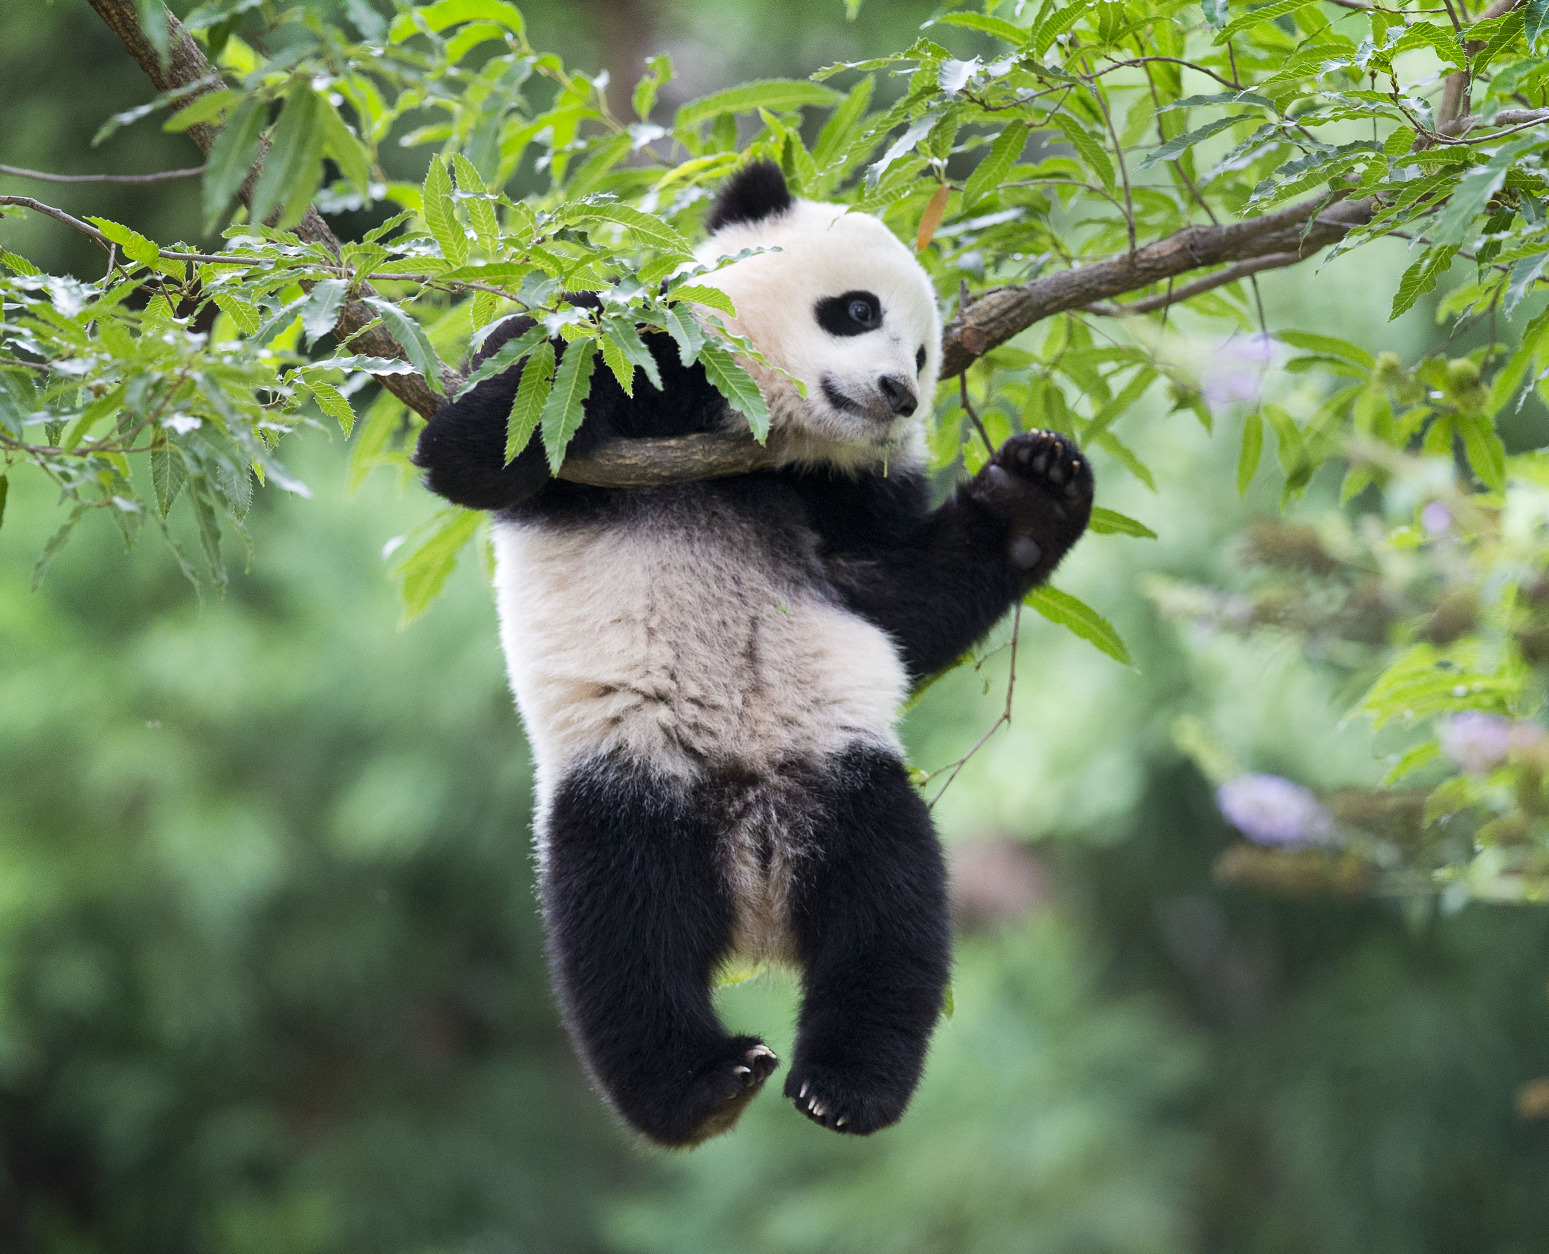 Jalan-jalan Seru Melihat Panda Menggemaskan di Taman Safari